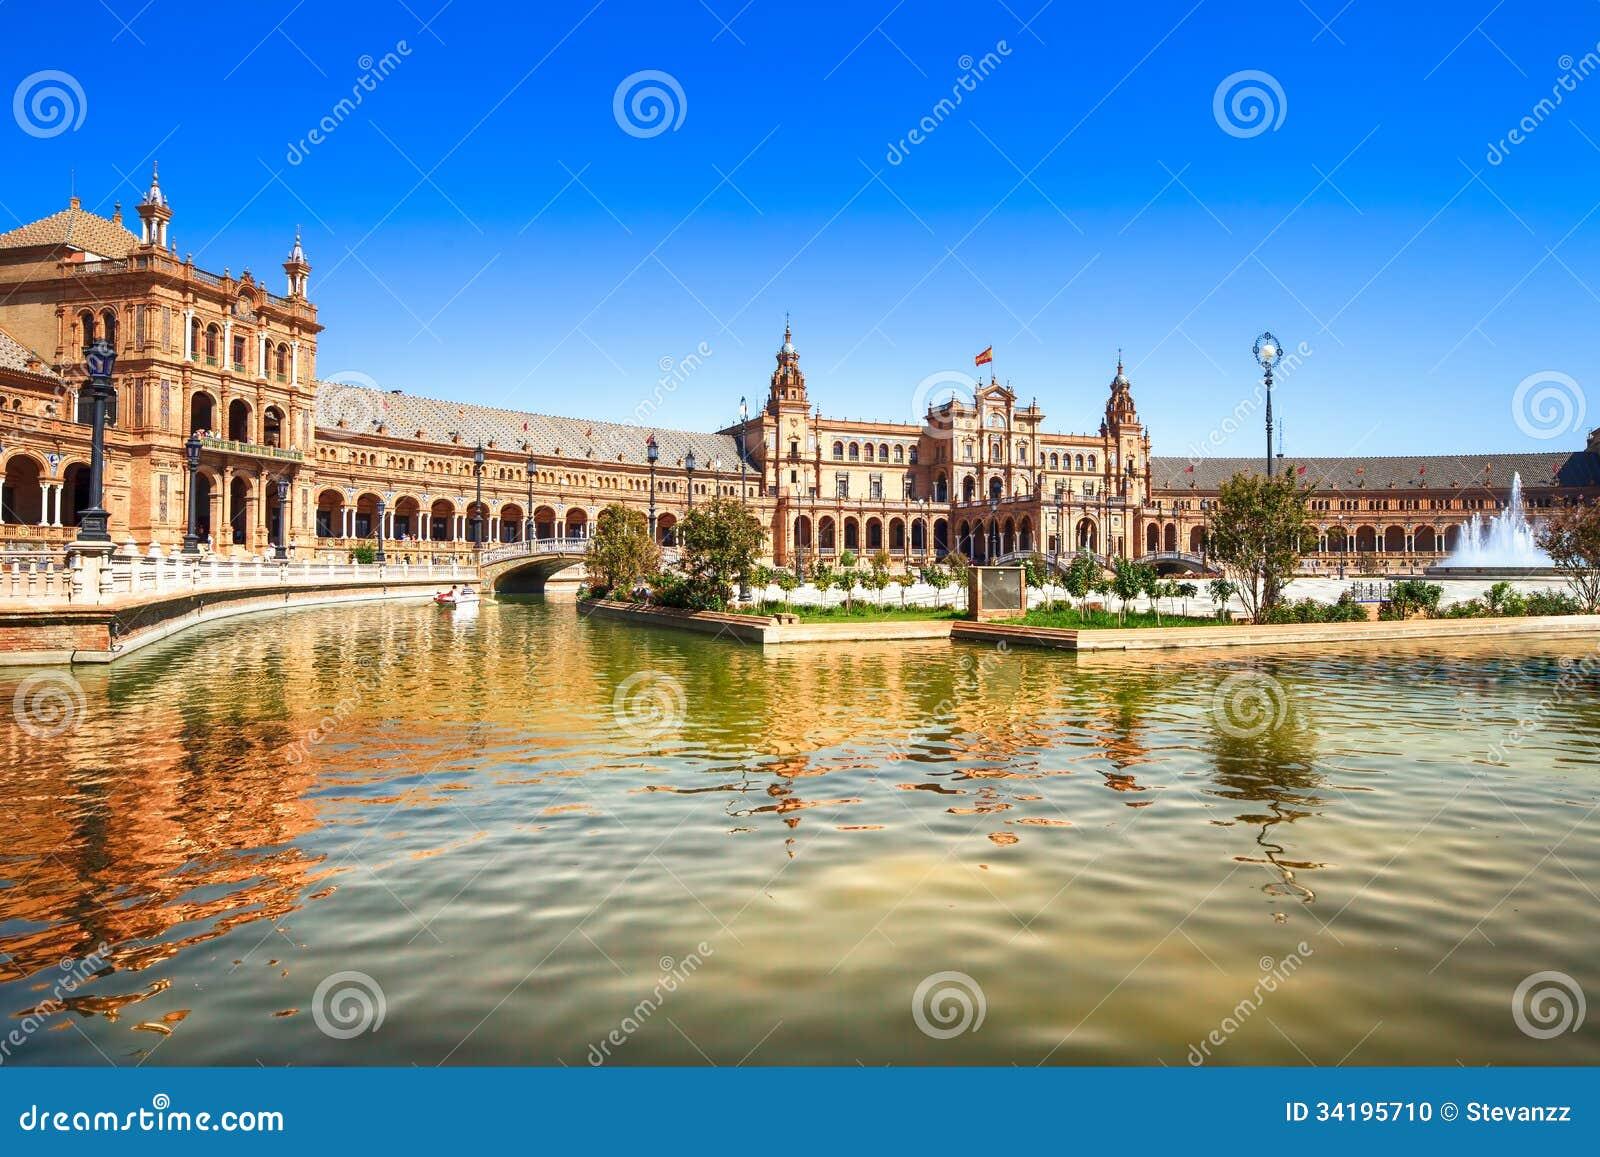 Plaza de espana Siviglia, Andalusia, Spagna, Europa